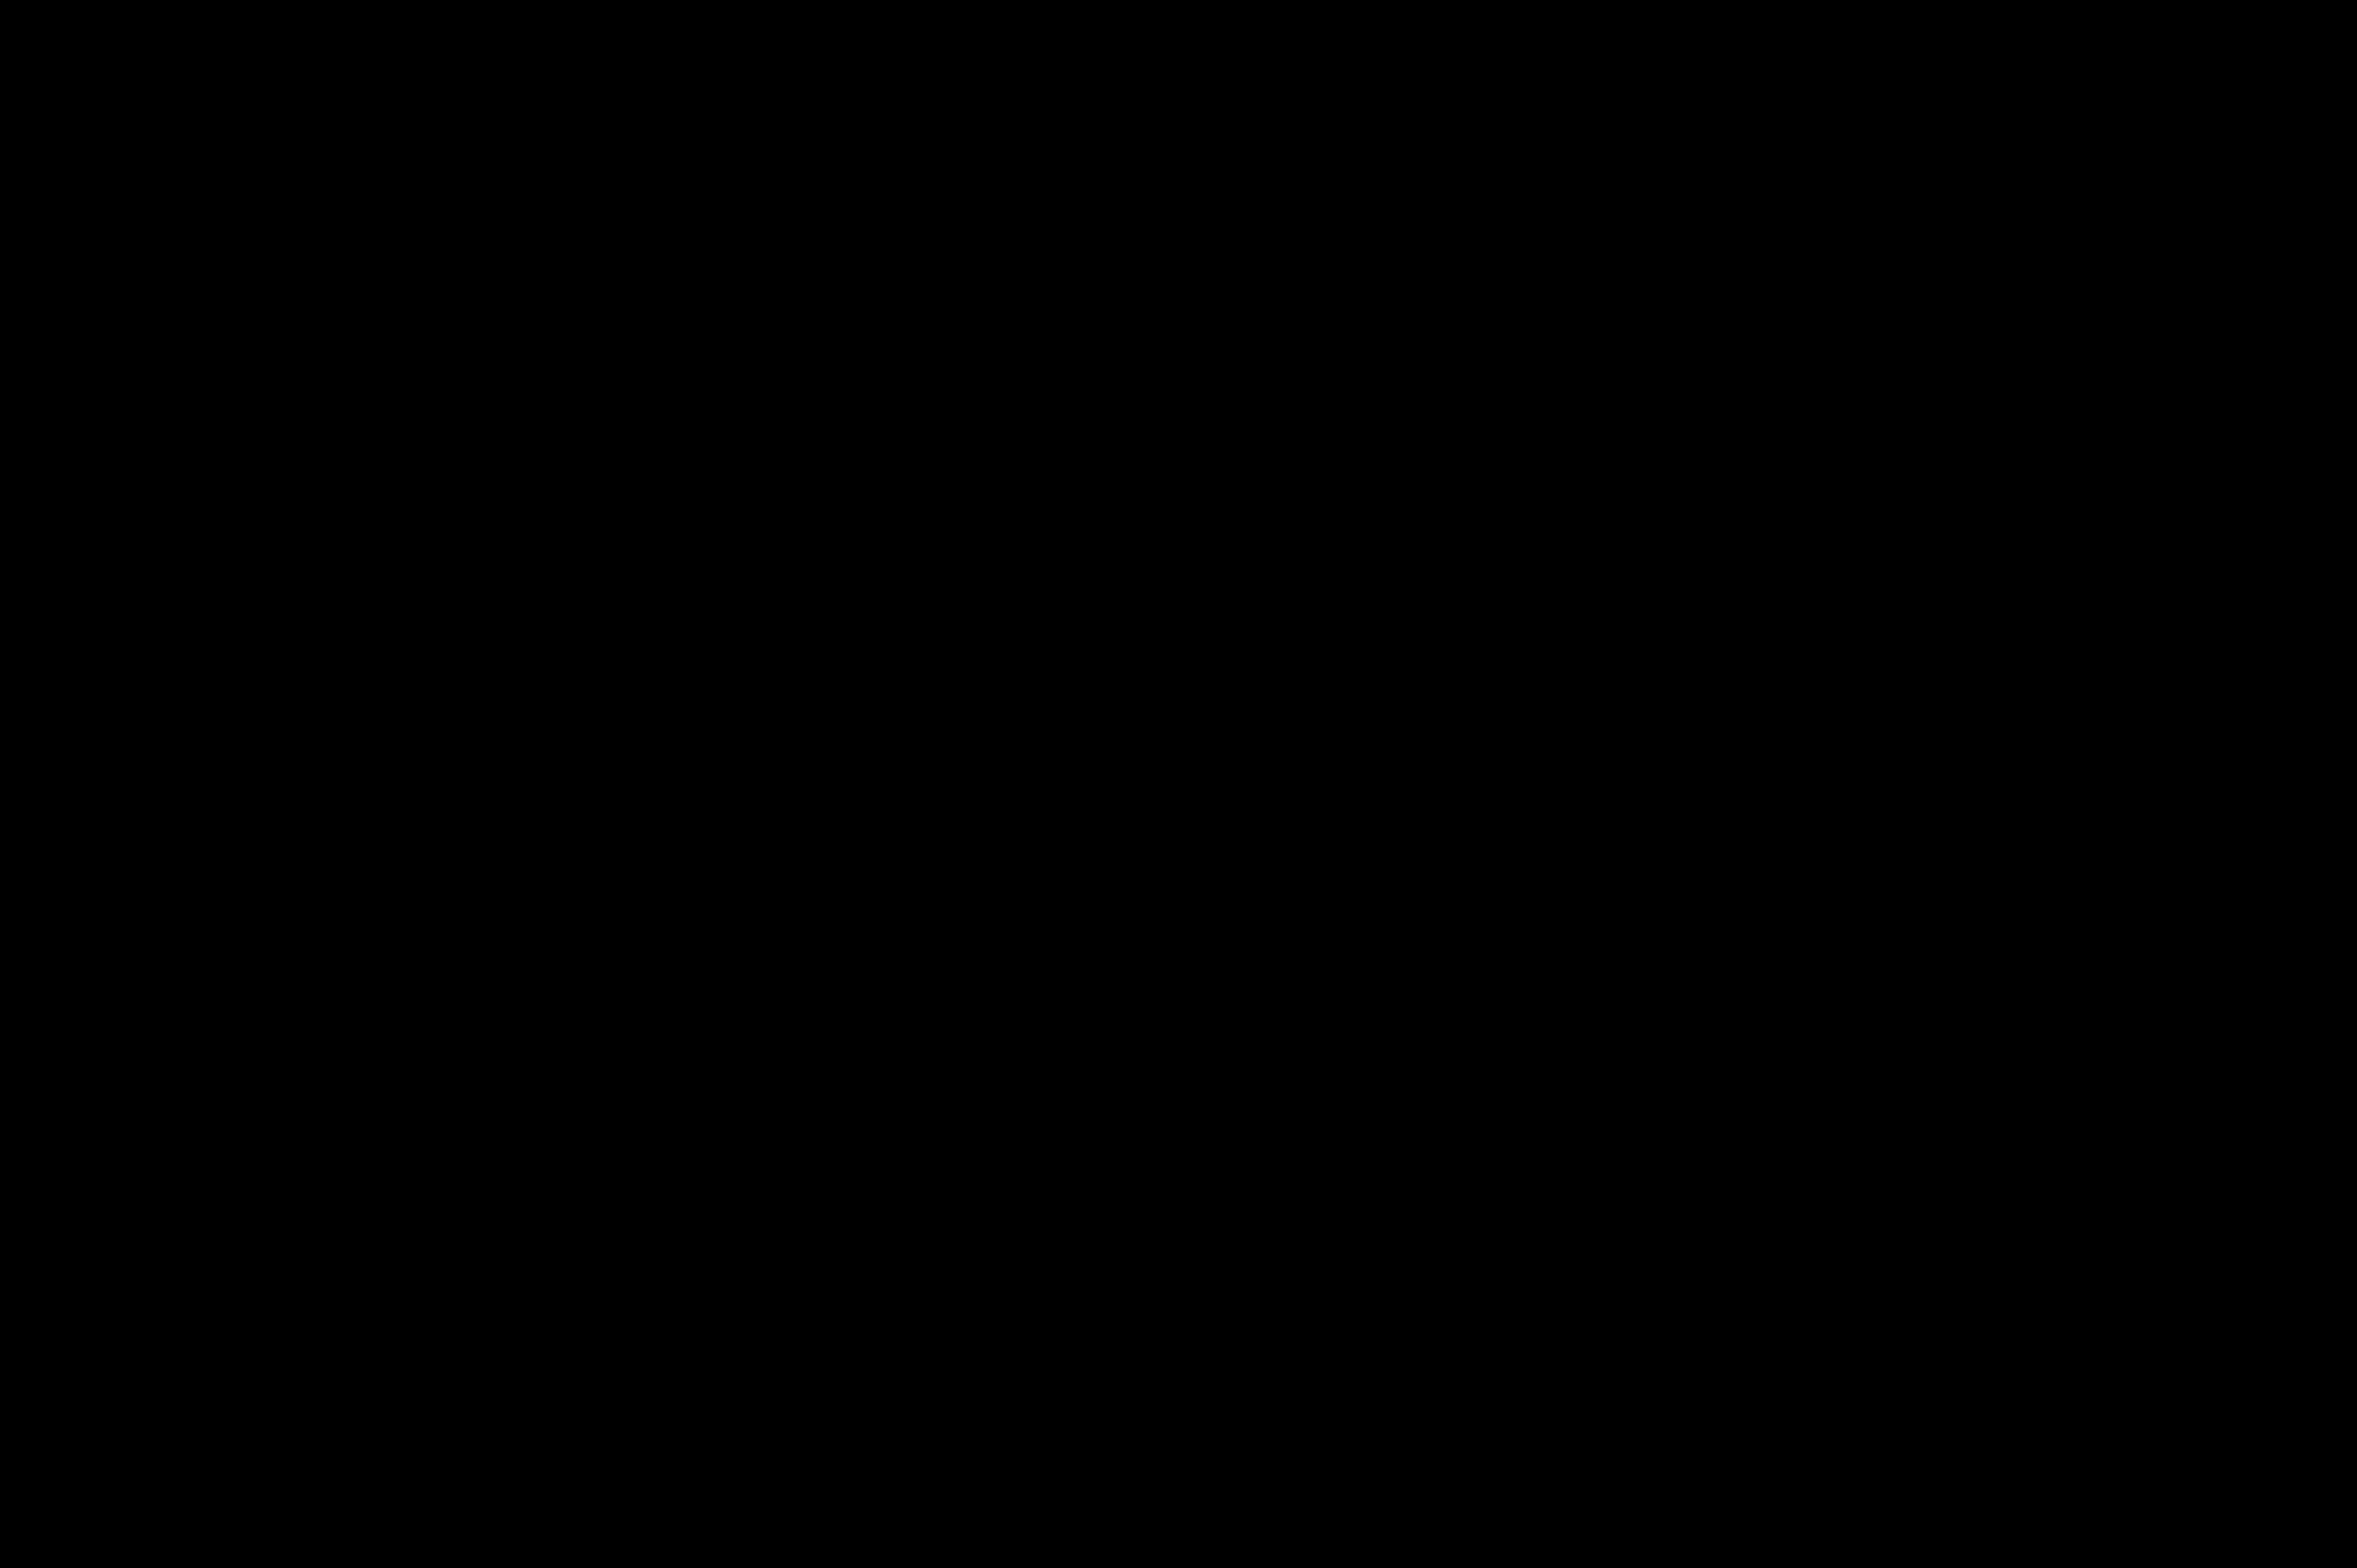 _2BP0073_A